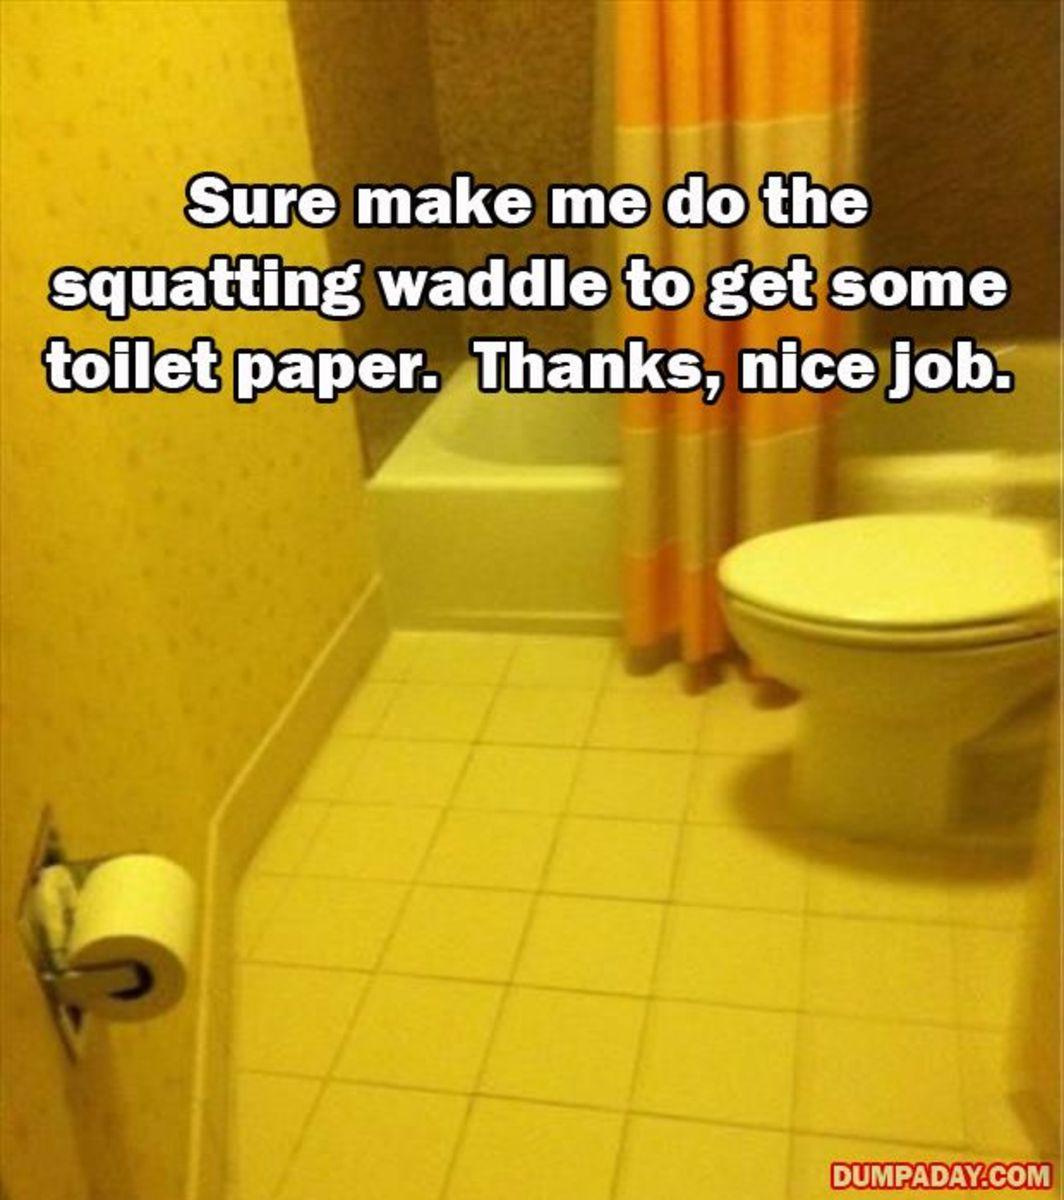 Good luck, fellows. Toilet tissue epic fail.